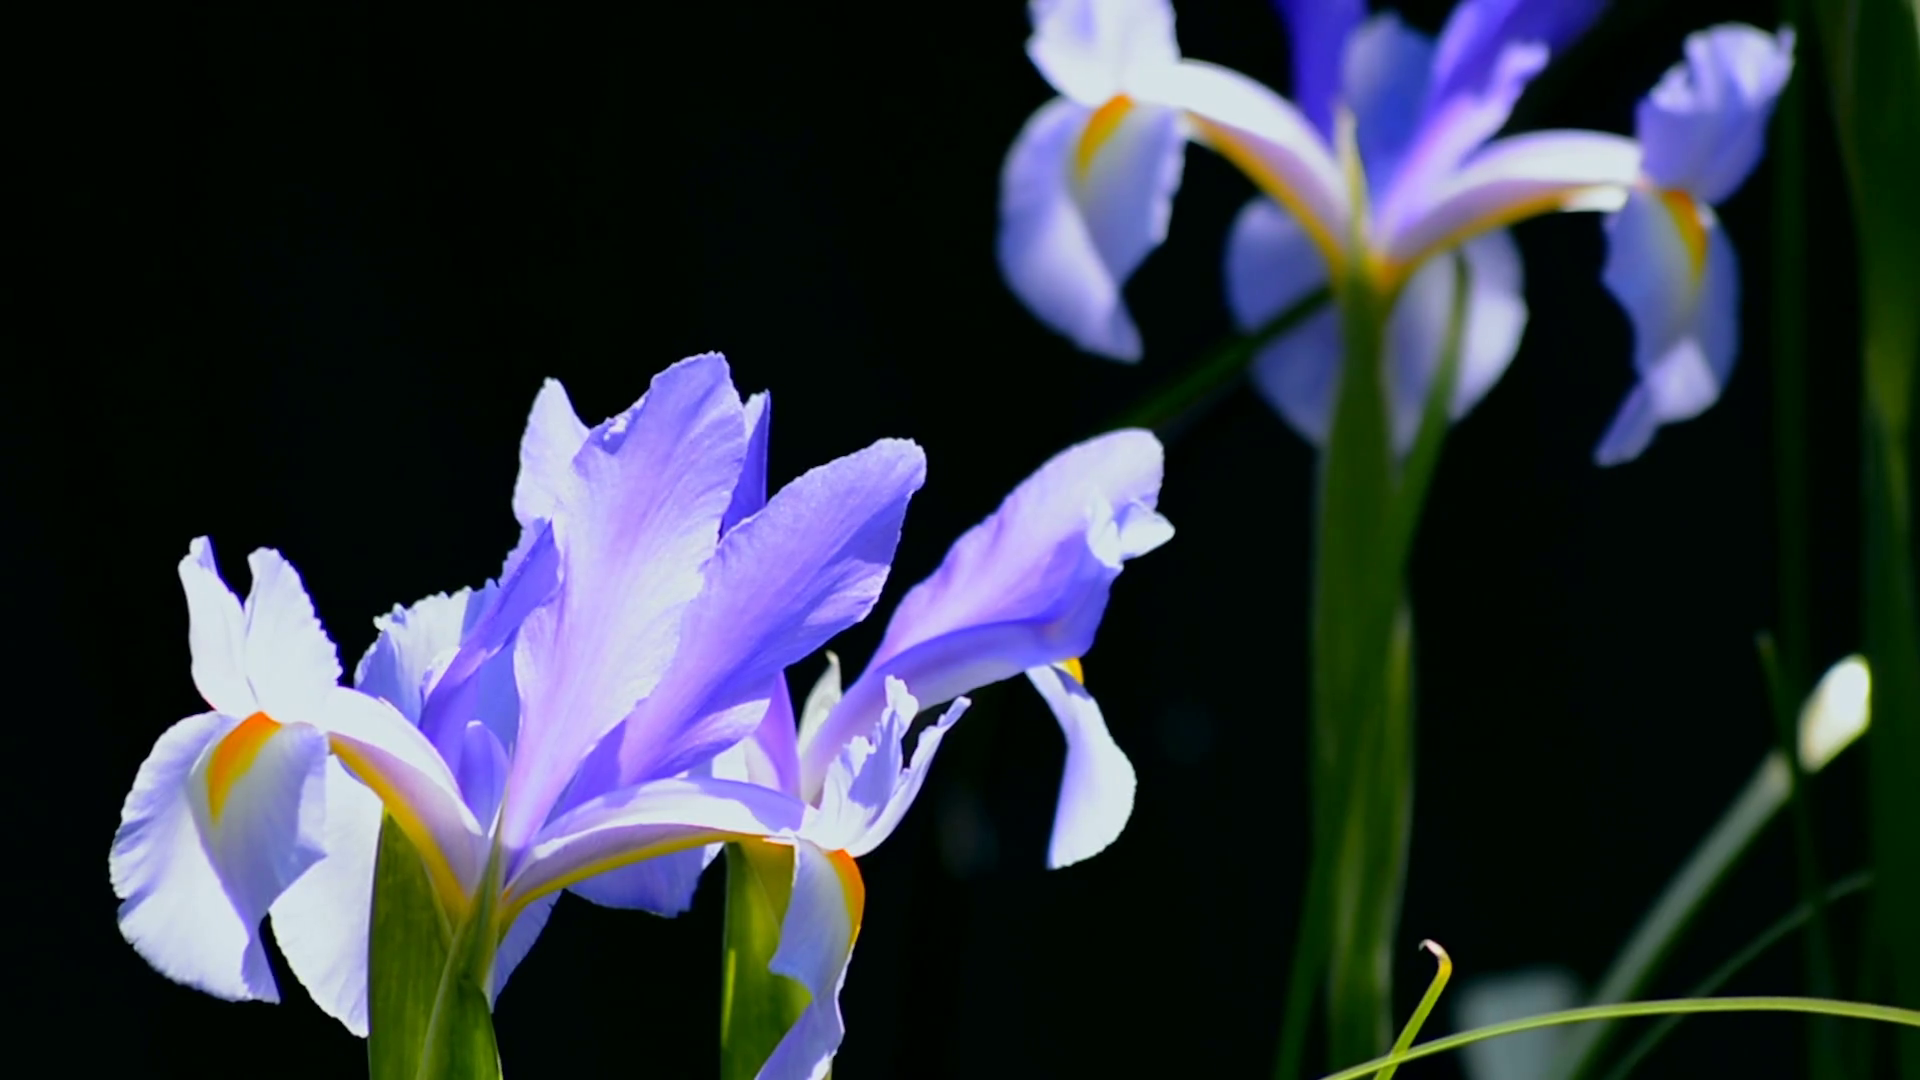 Iris Flower Png Hd Transparent Iris Flower Hdg Images Pluspng